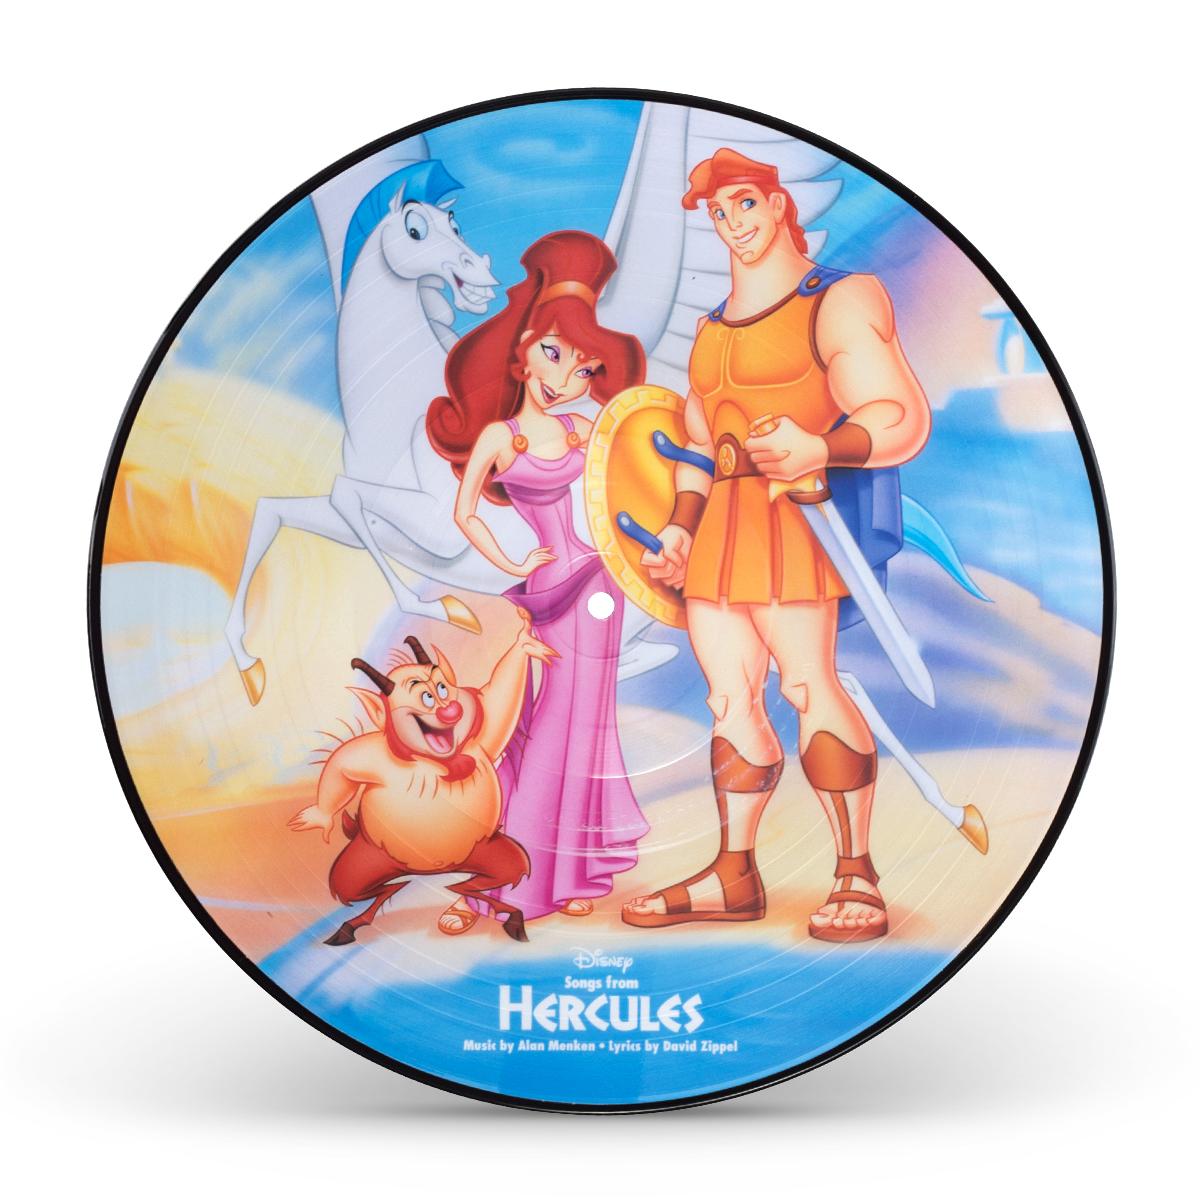 Hercules picture vinyl shop the disney music emporium - Hercule walt disney ...